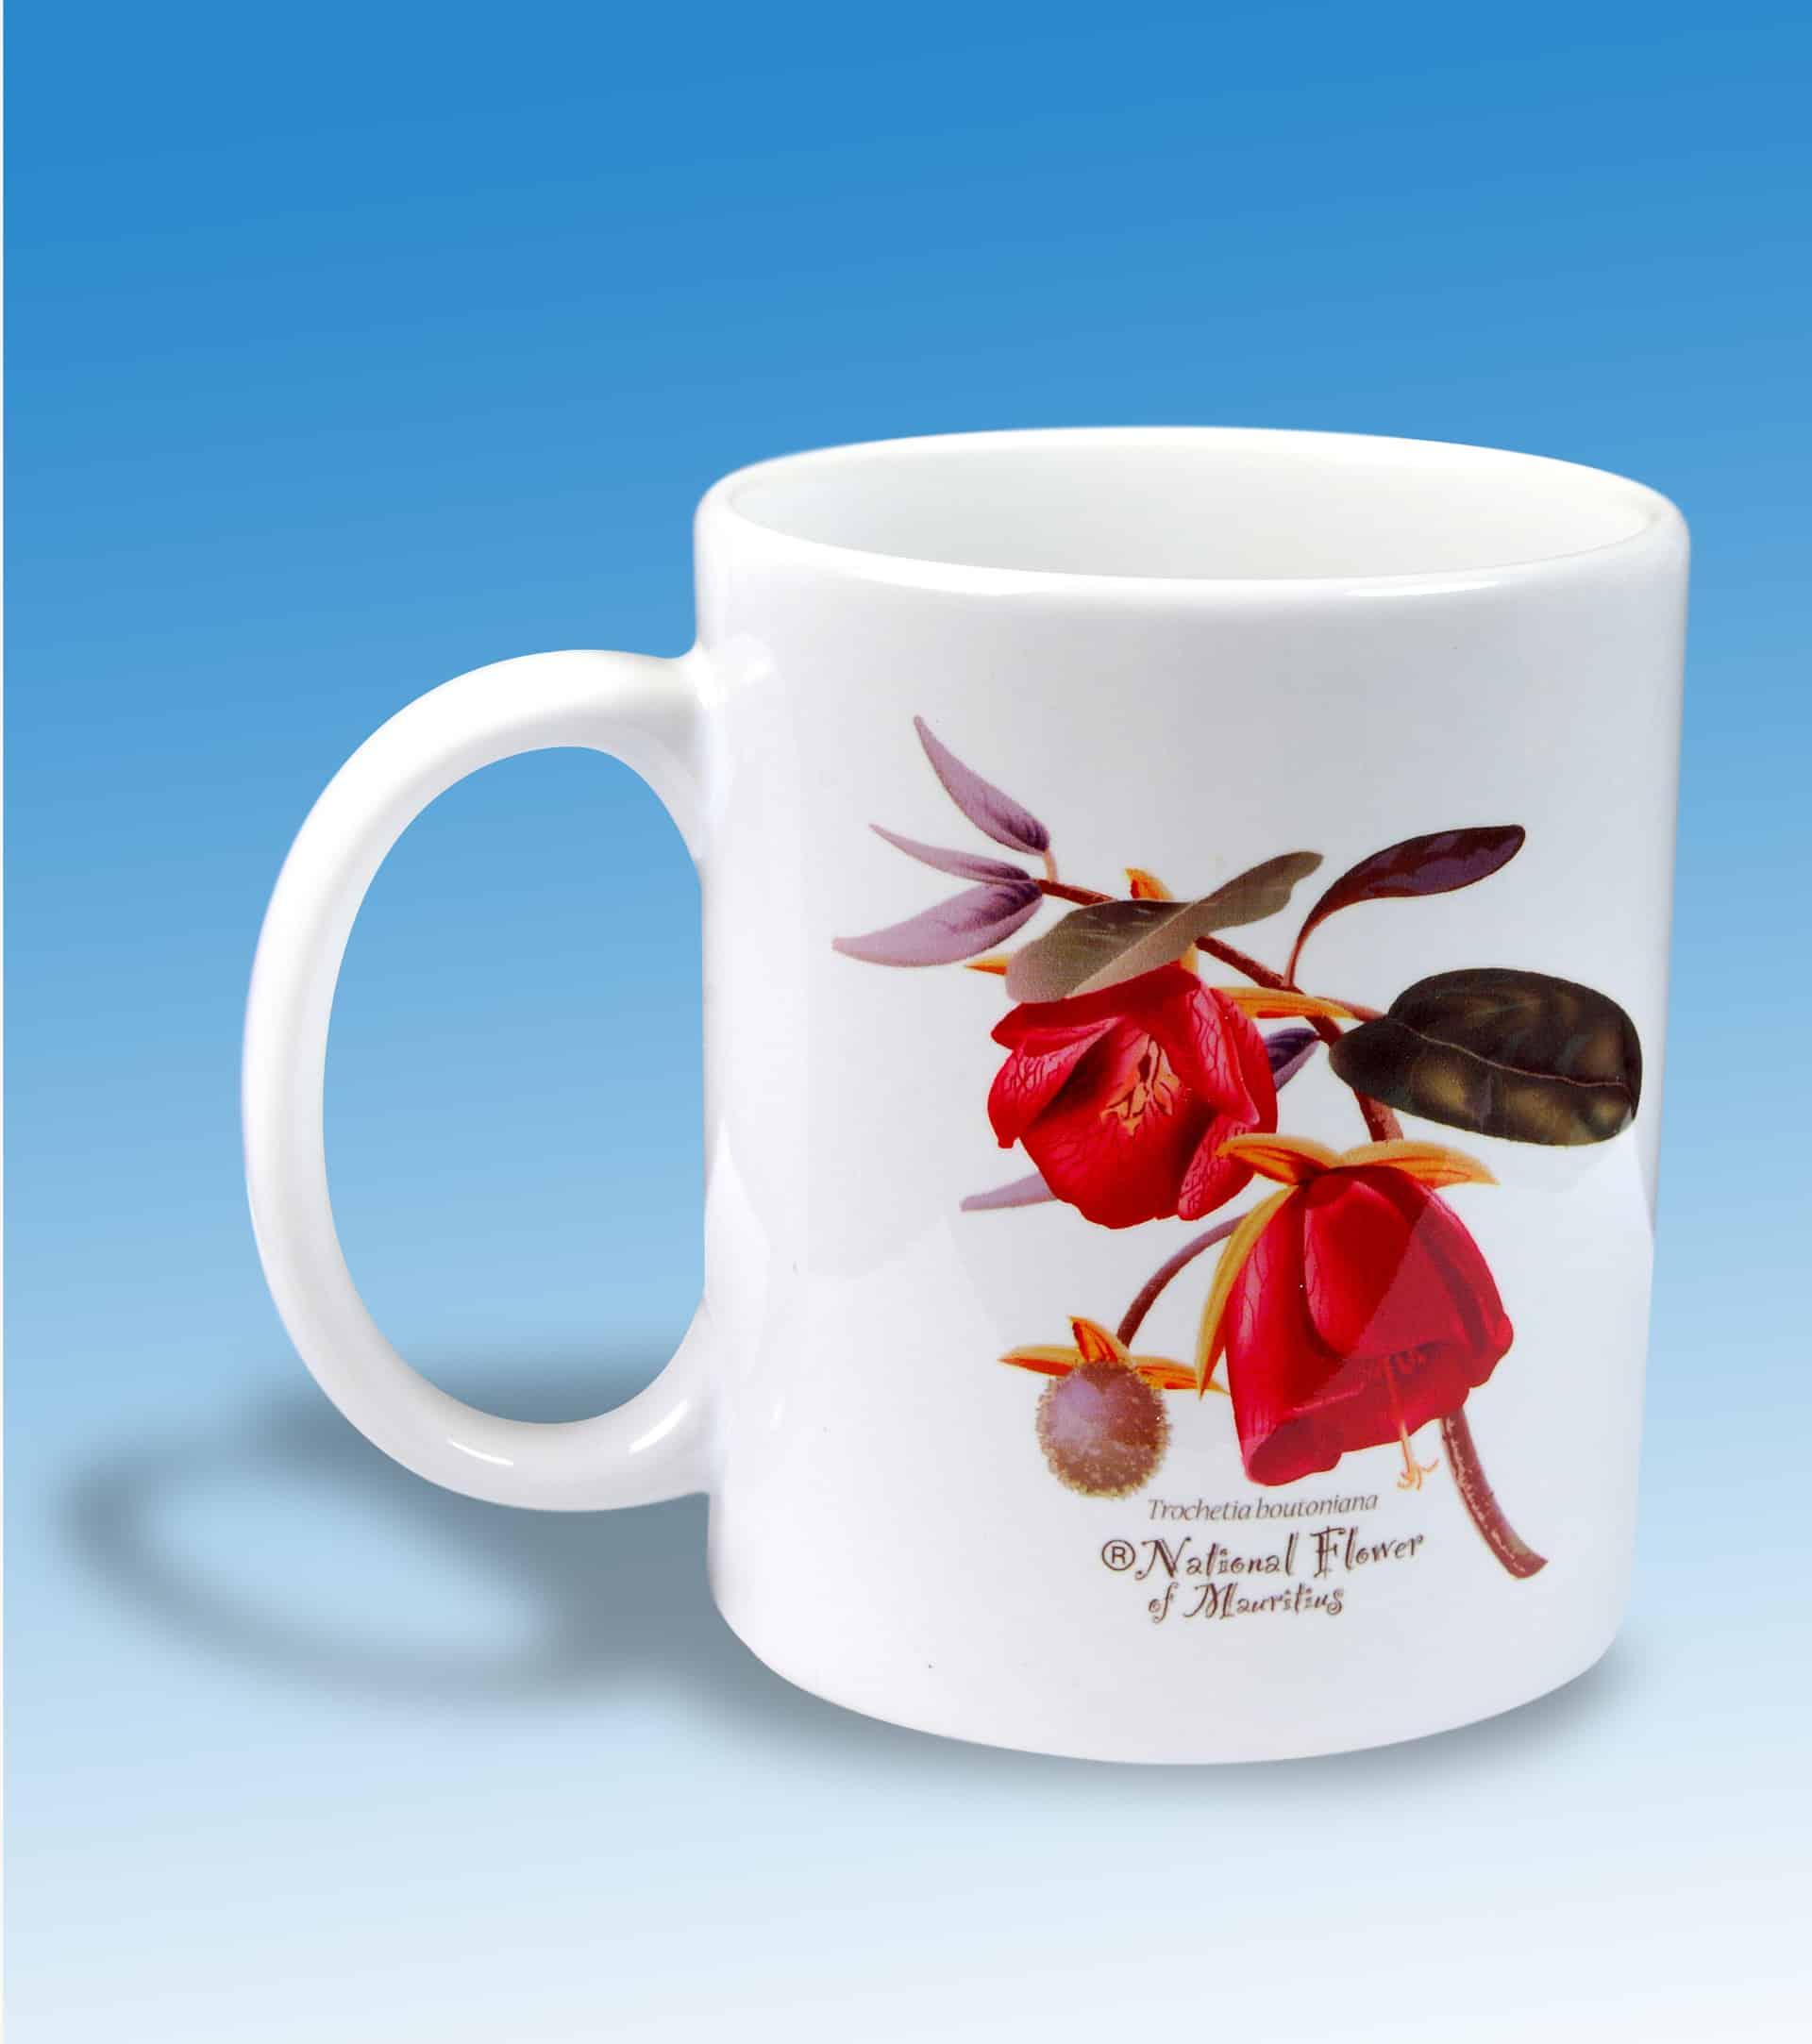 souvenir-mauritius-trochetia-mug